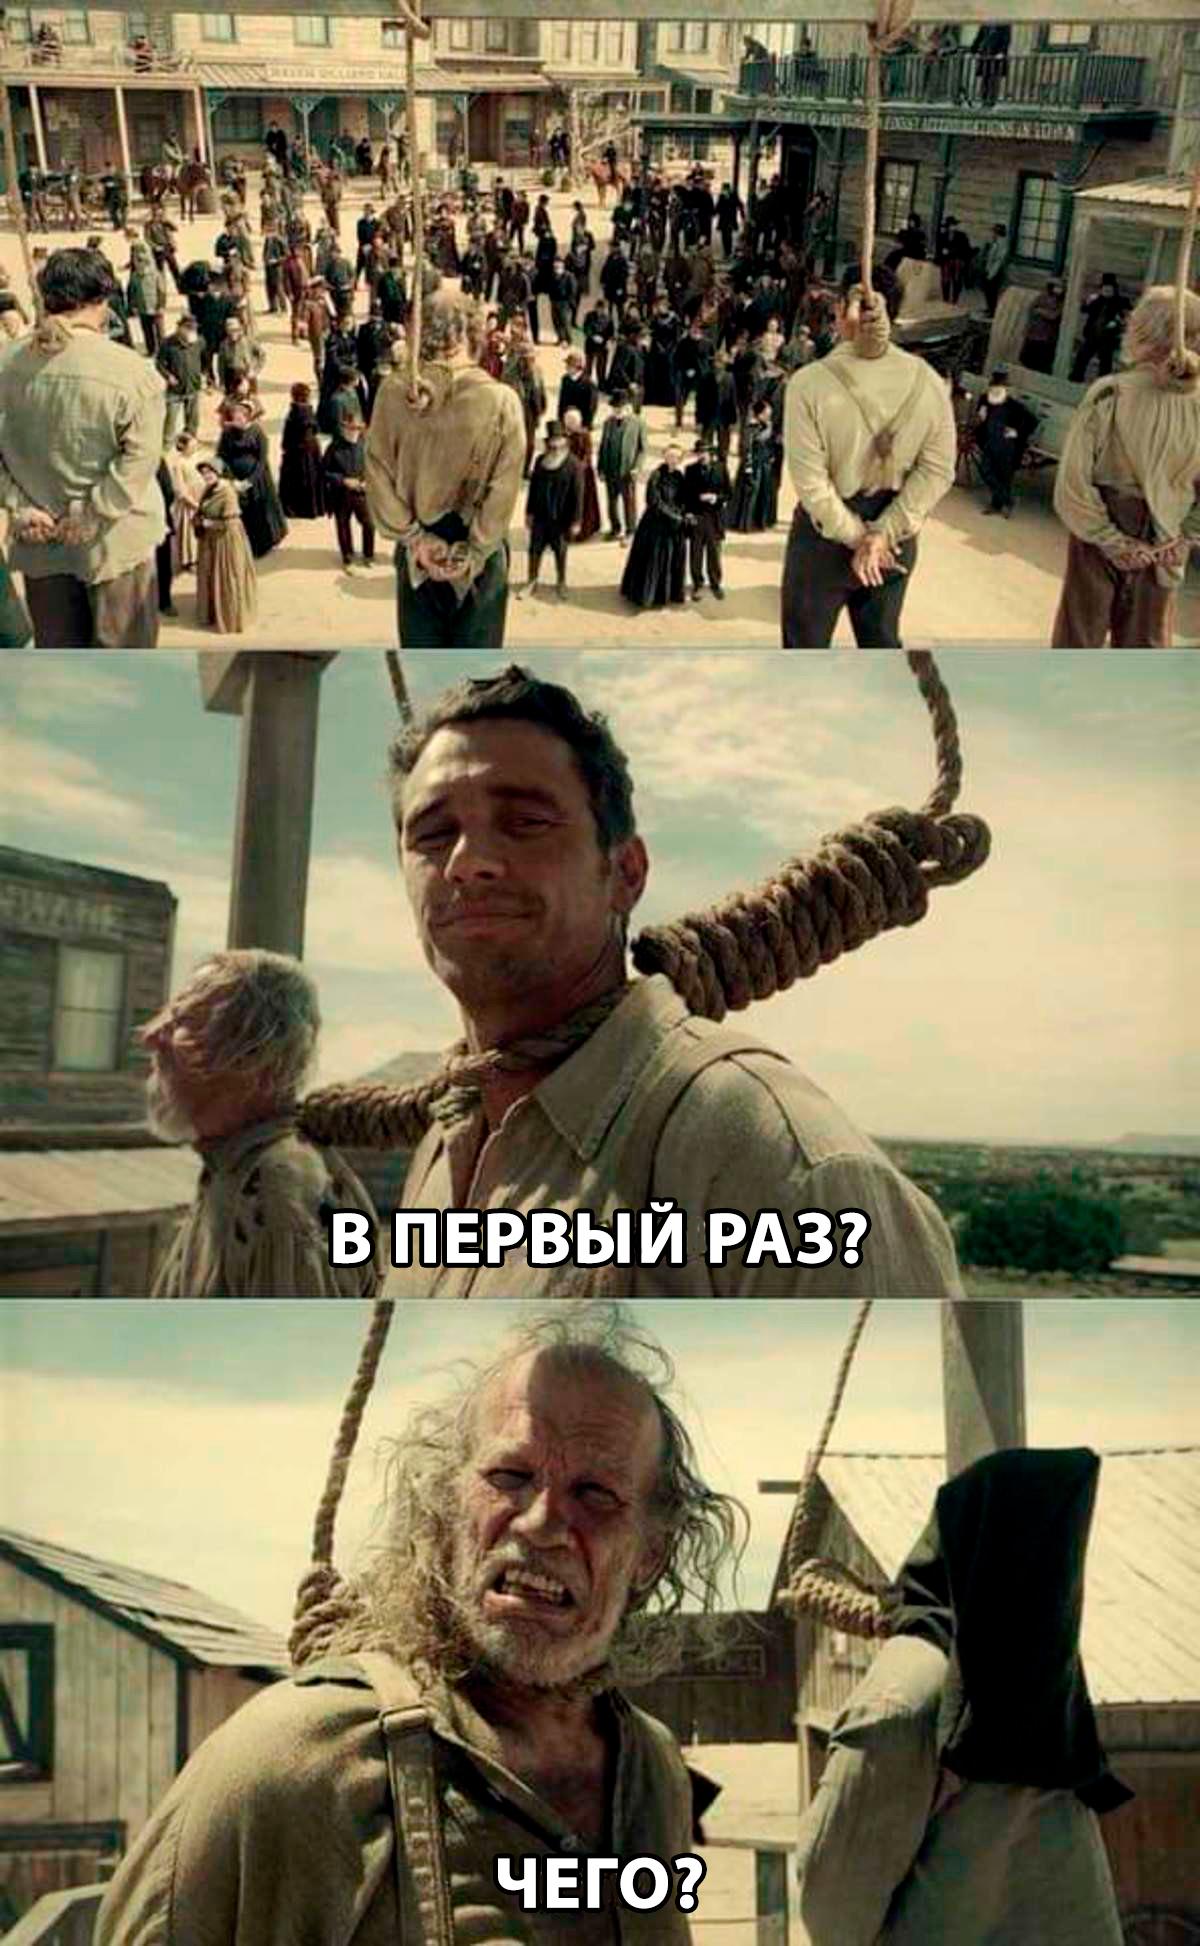 https://cs7.pikabu.ru/post_img/big/2018/12/13/9/1544711094191897966.jpg